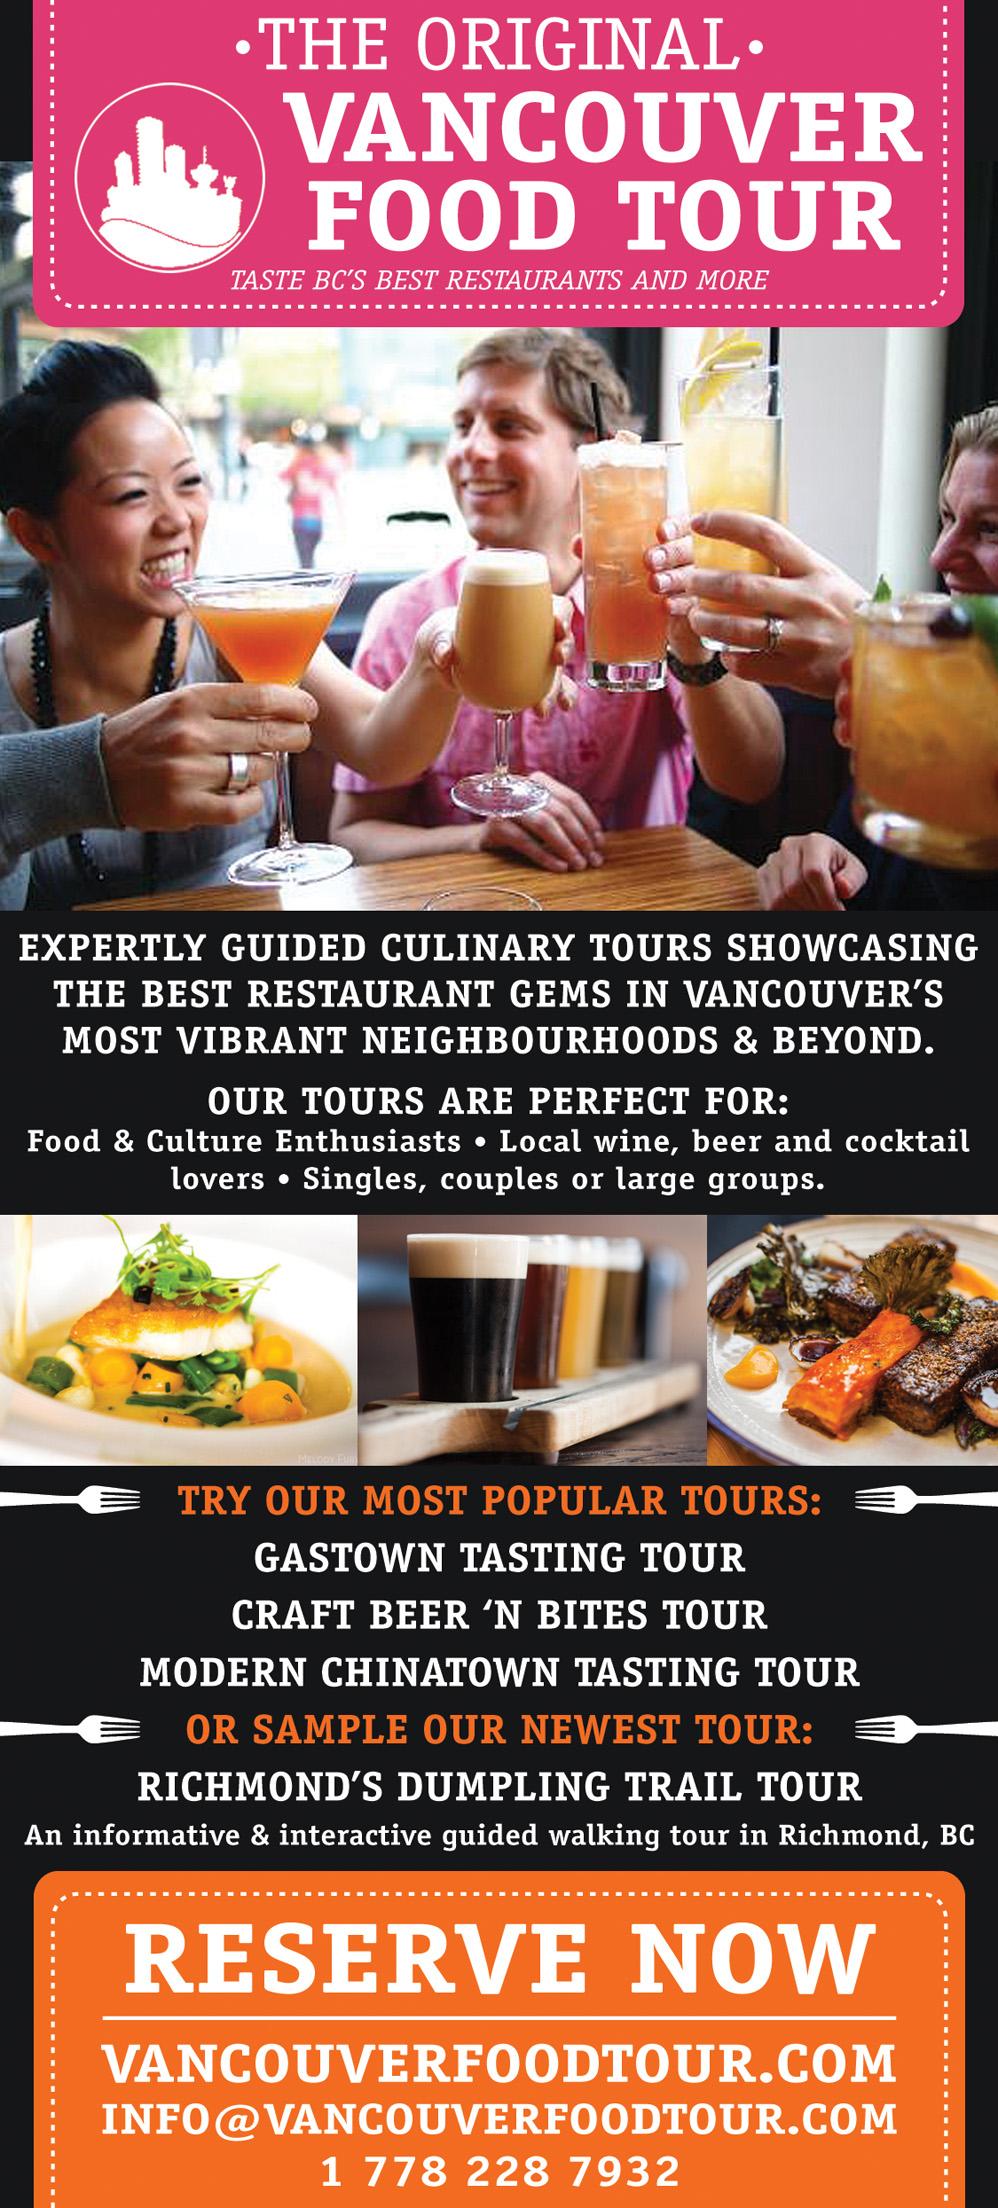 The Original Vancouver Food Tour